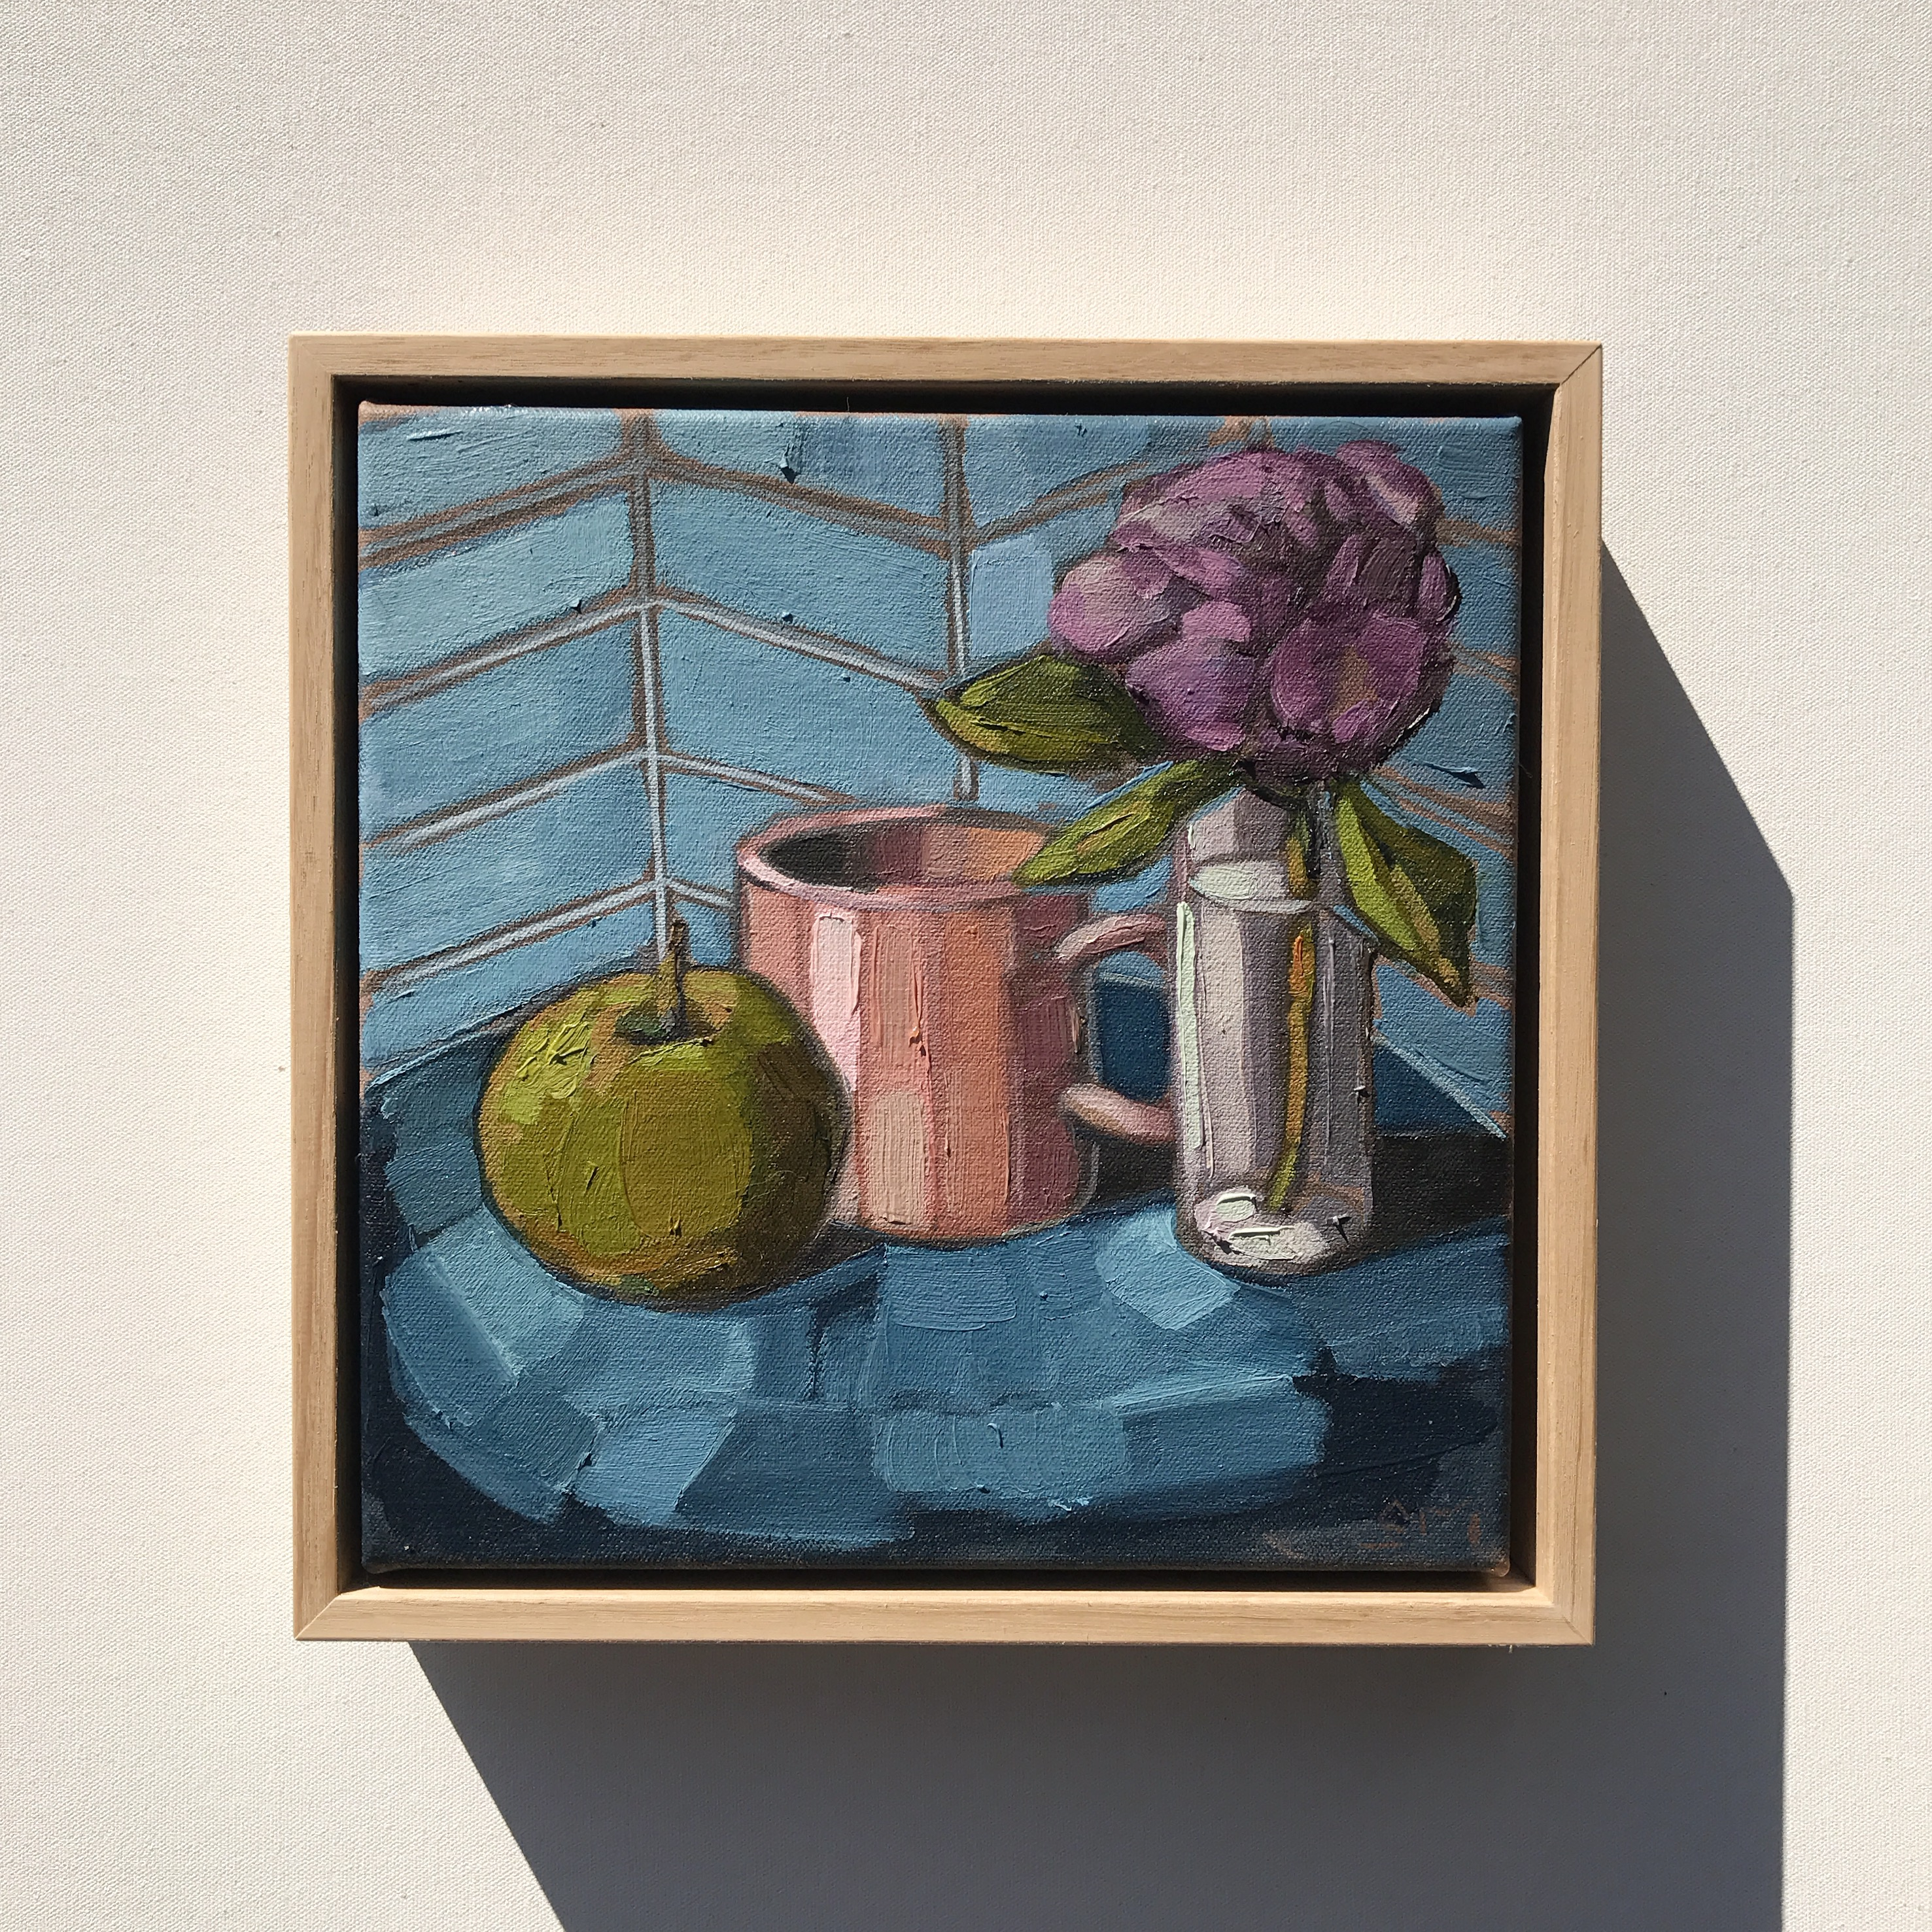 'Pink Mug' 27x27cm $495